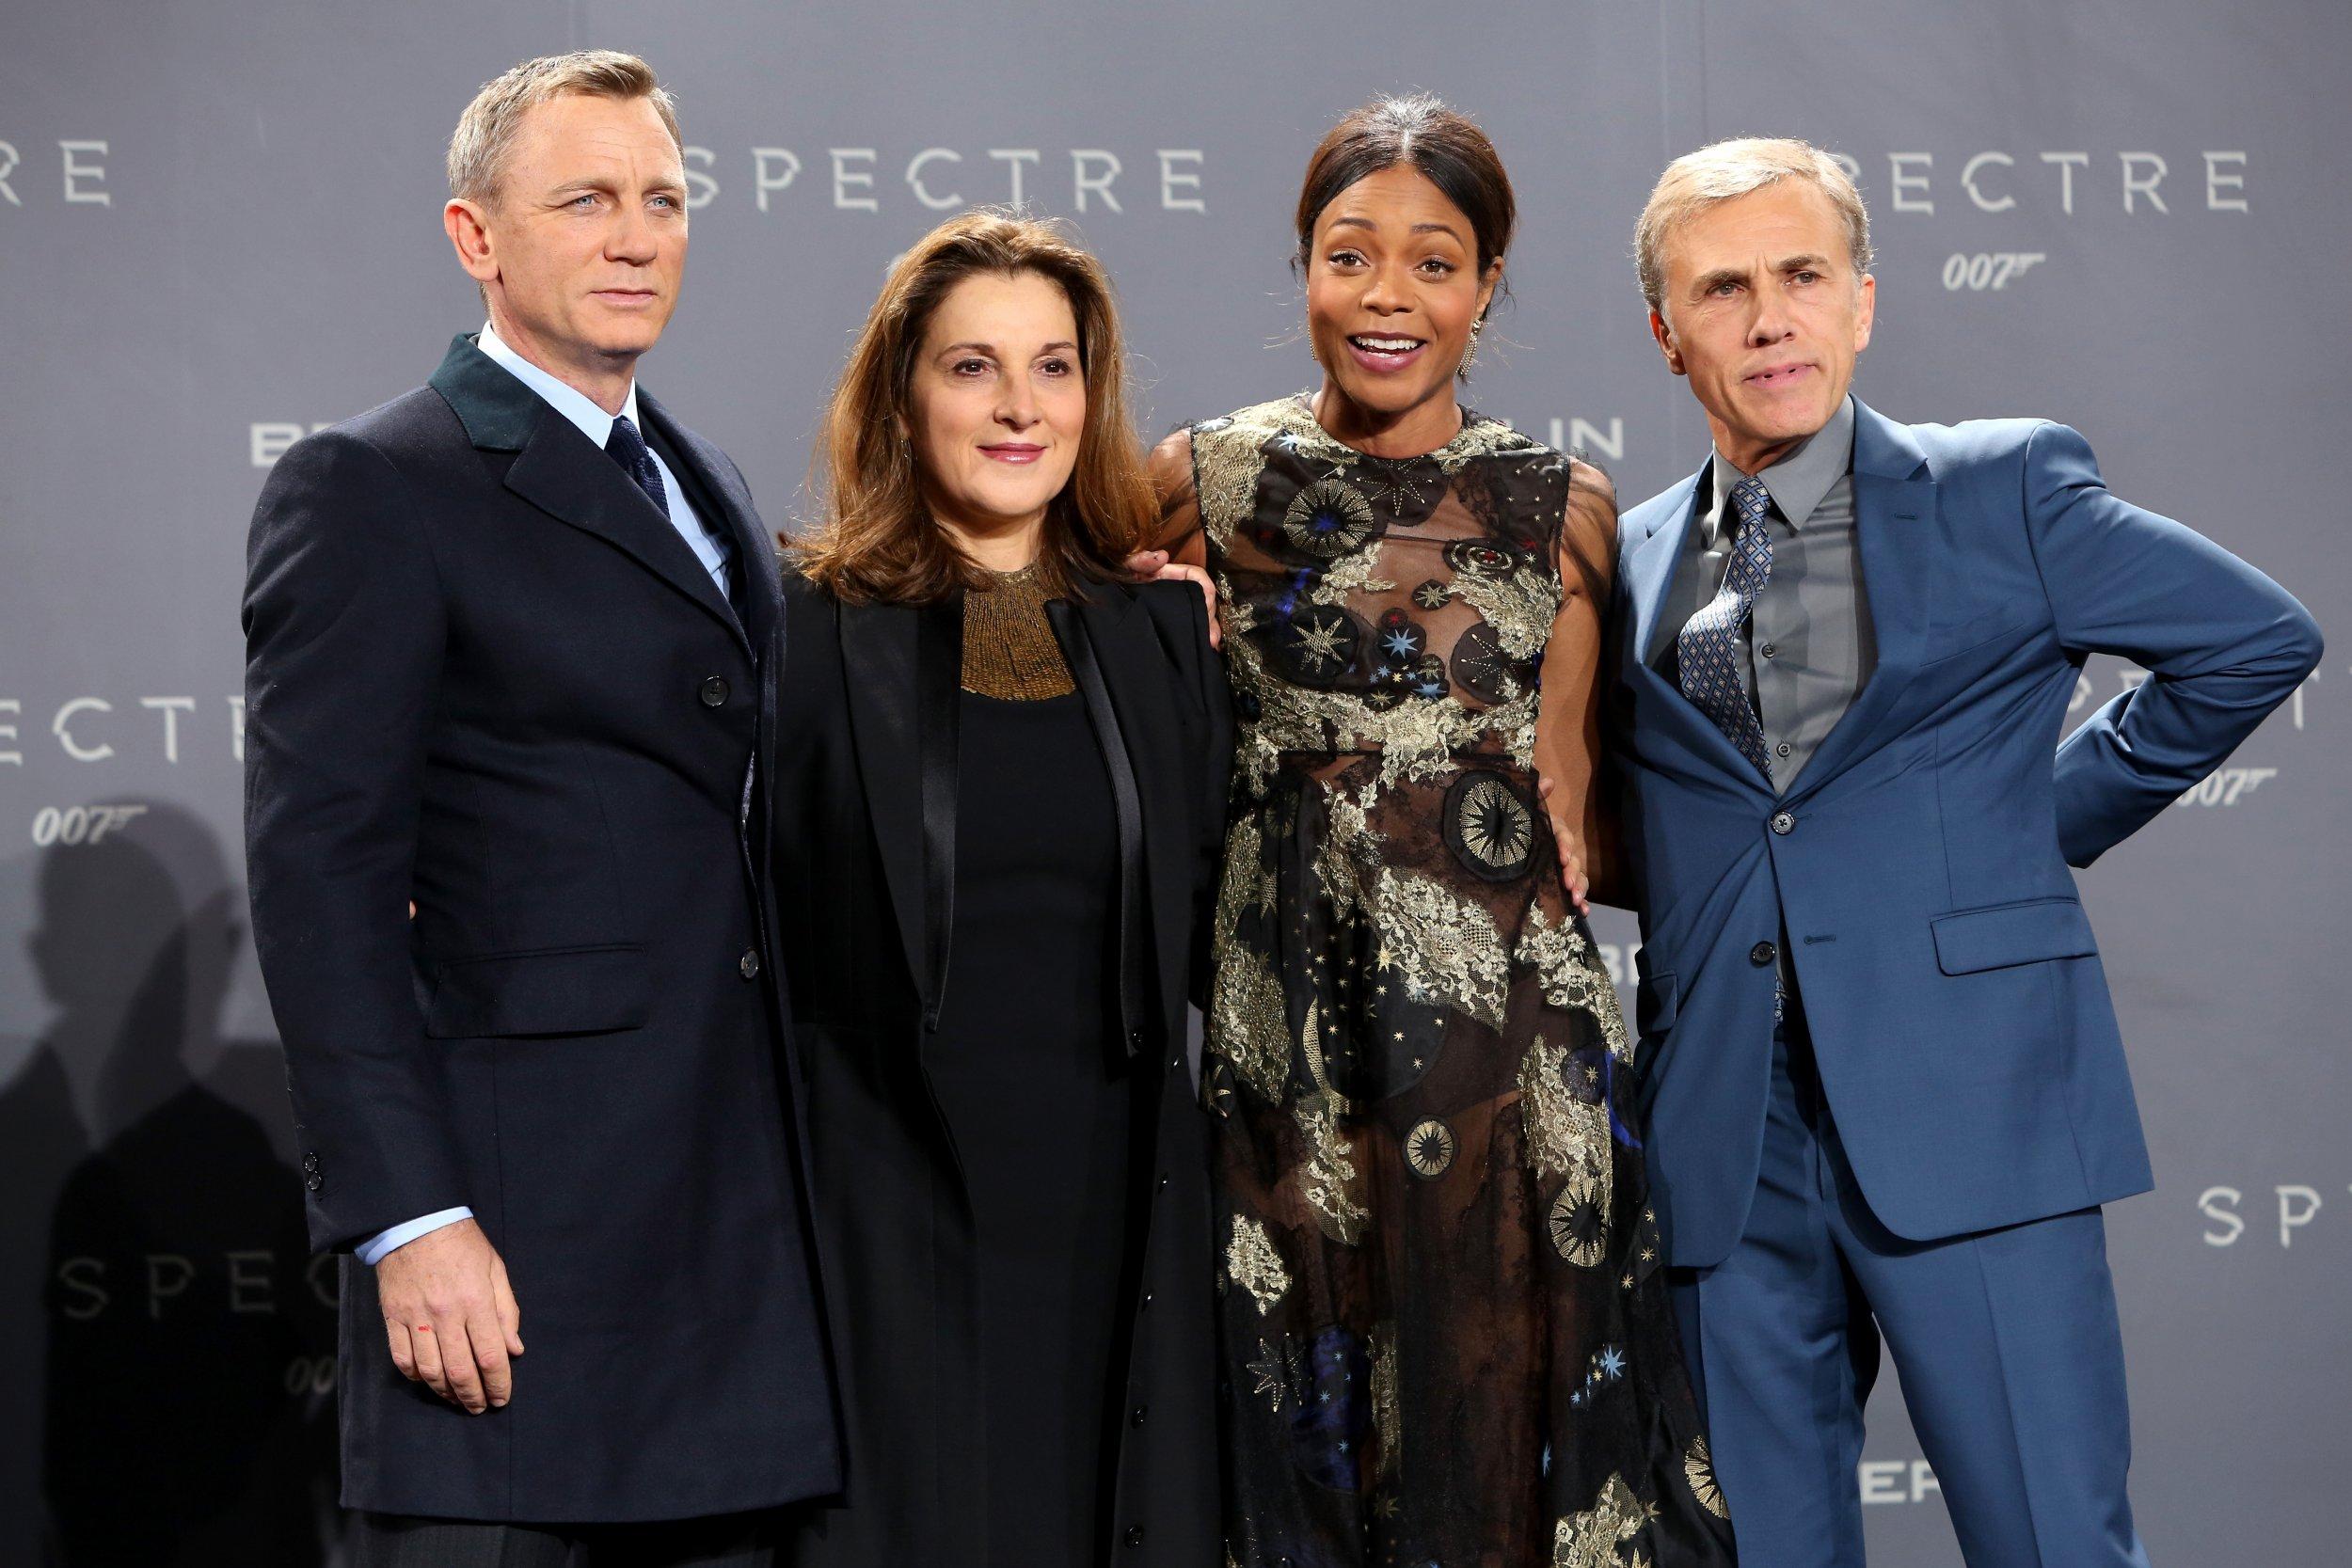 James Bond producer Barbara Broccoli with Daniel Craig